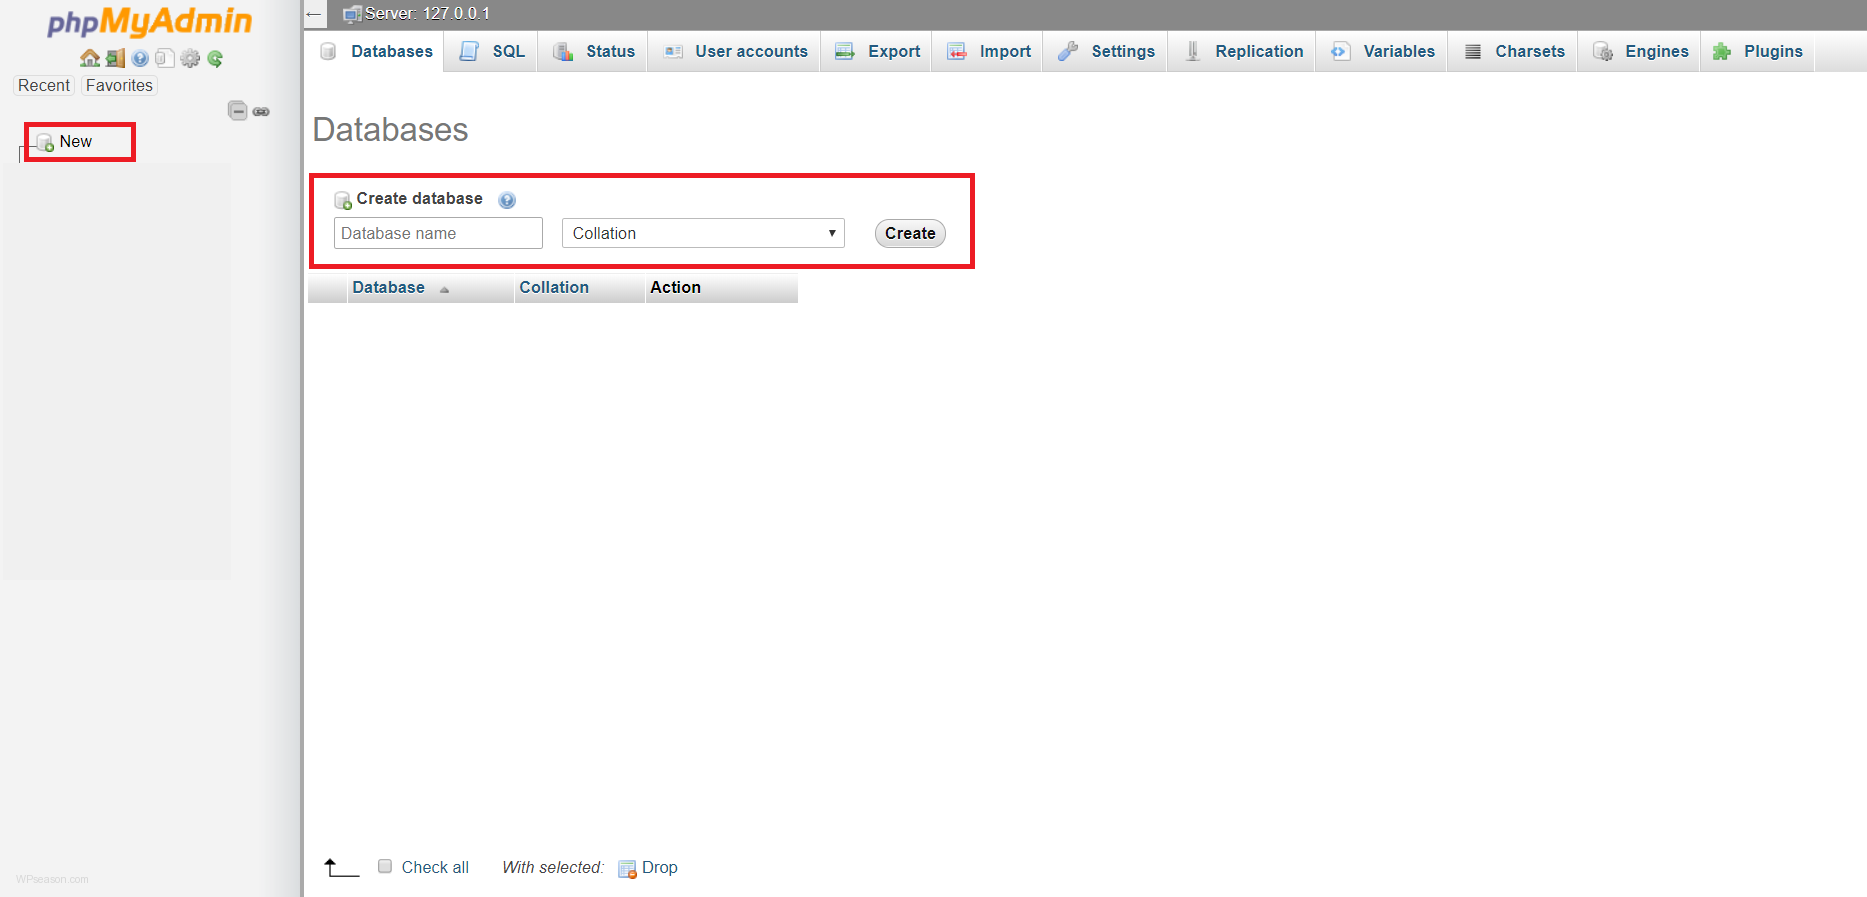 phpmyadmin new database